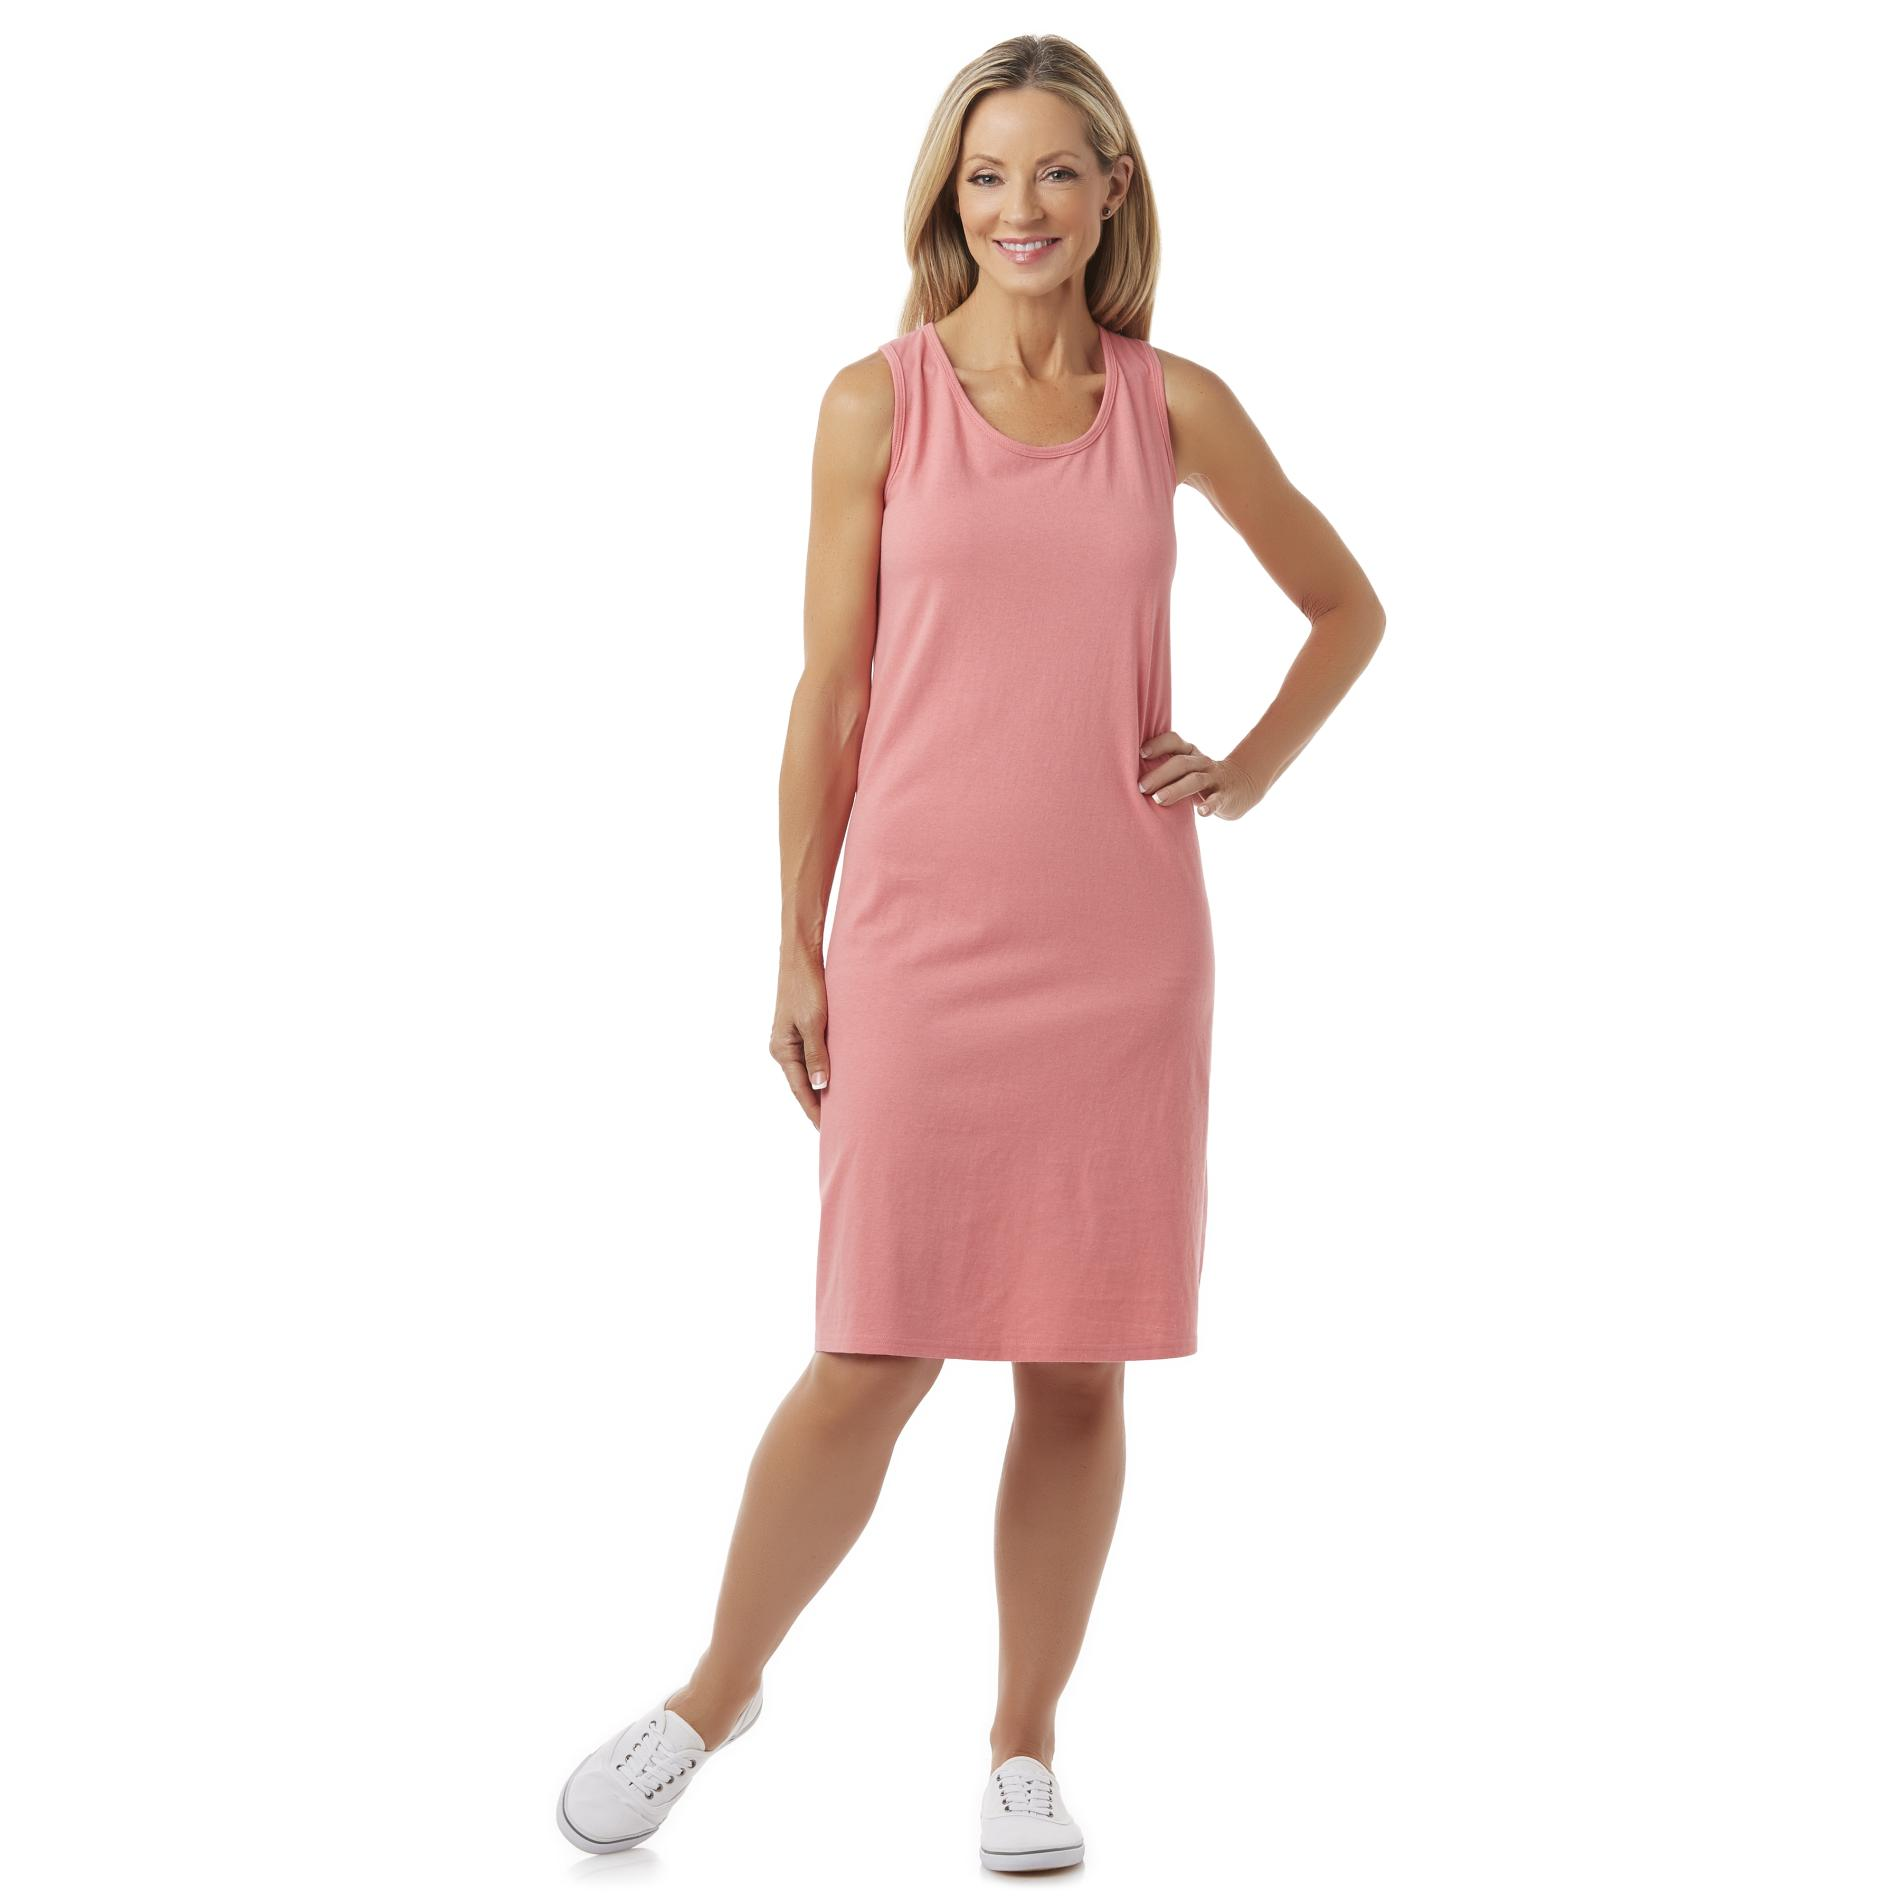 Basic Editions Women39s Midi Tank Dress Kmart